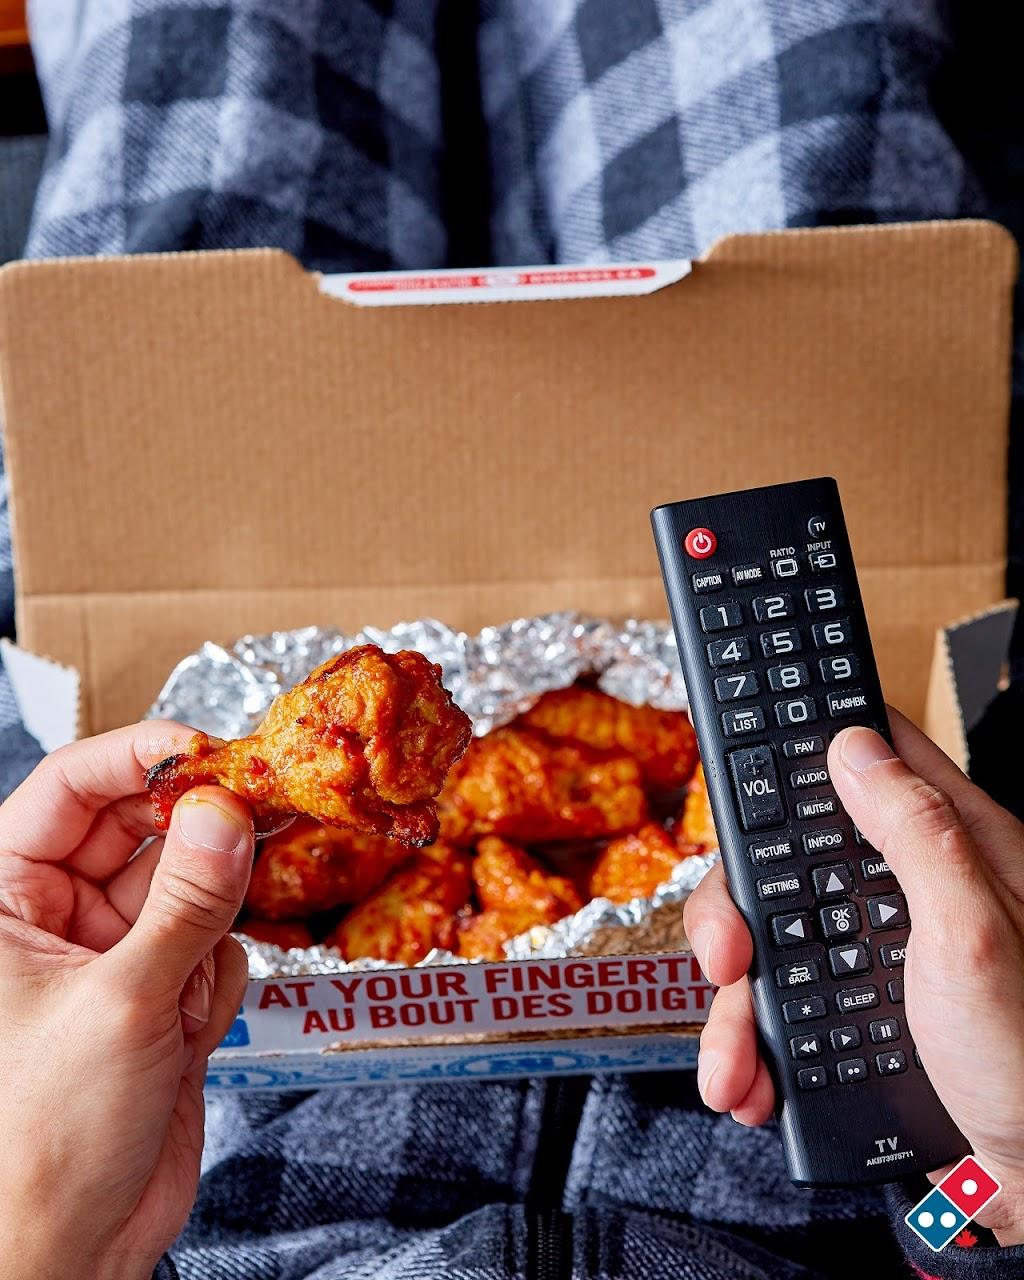 Dominos Pizza | meal delivery | 2805 6 Ave E, Prince Albert, SK S6V 6Z6, Canada | 3069531010 OR +1 306-953-1010